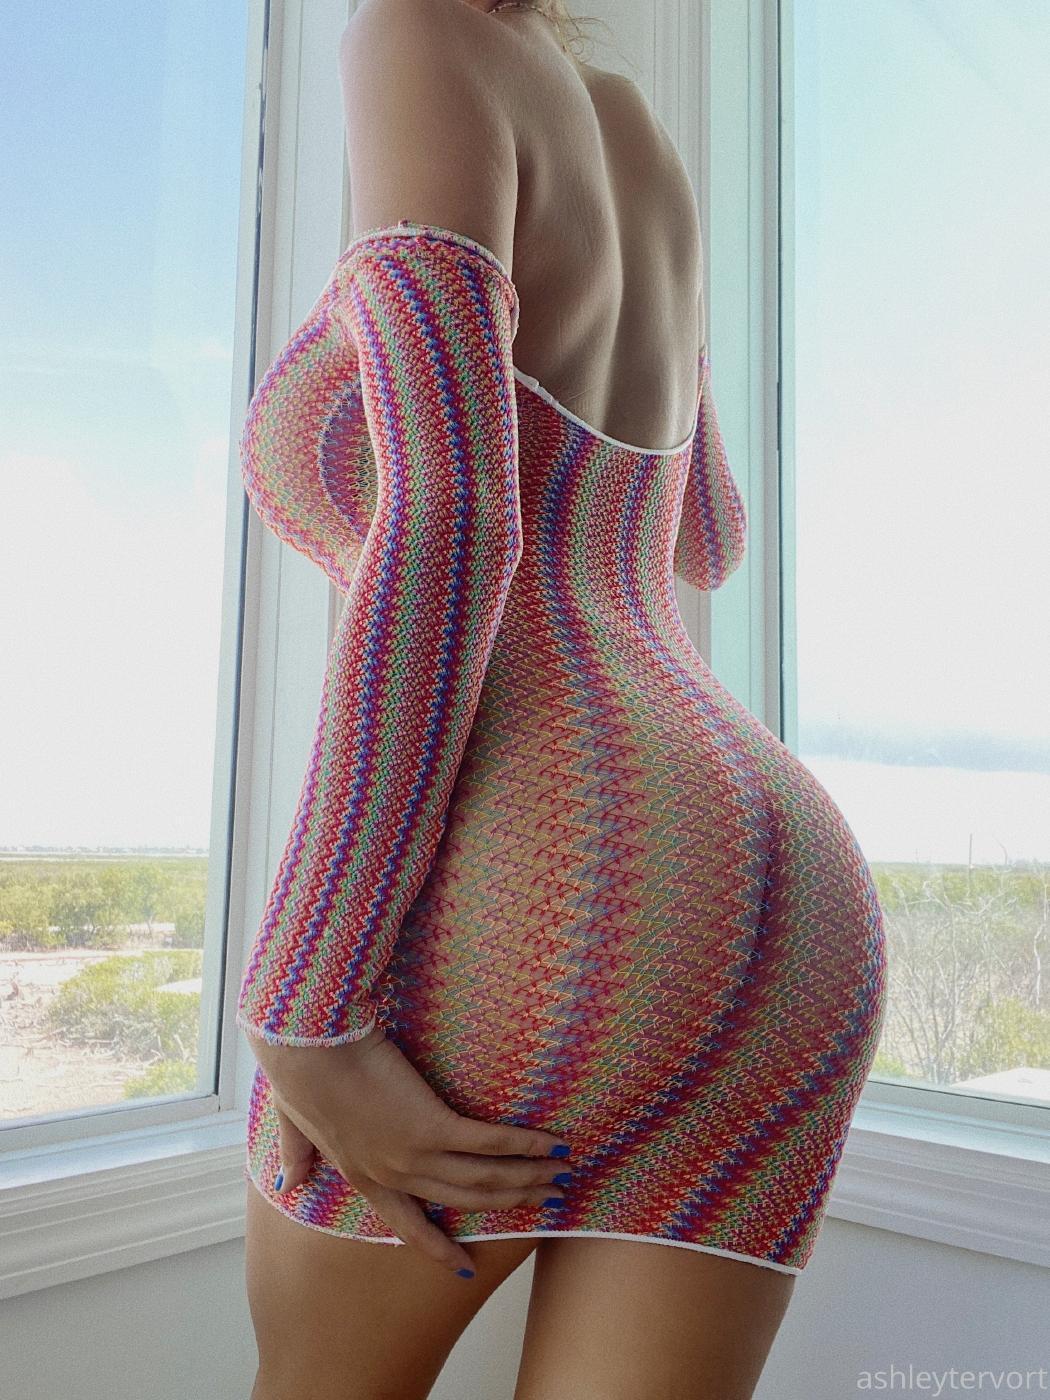 Ashley Tervort See Through Fishnet Dress Onlyfans Leaked 6